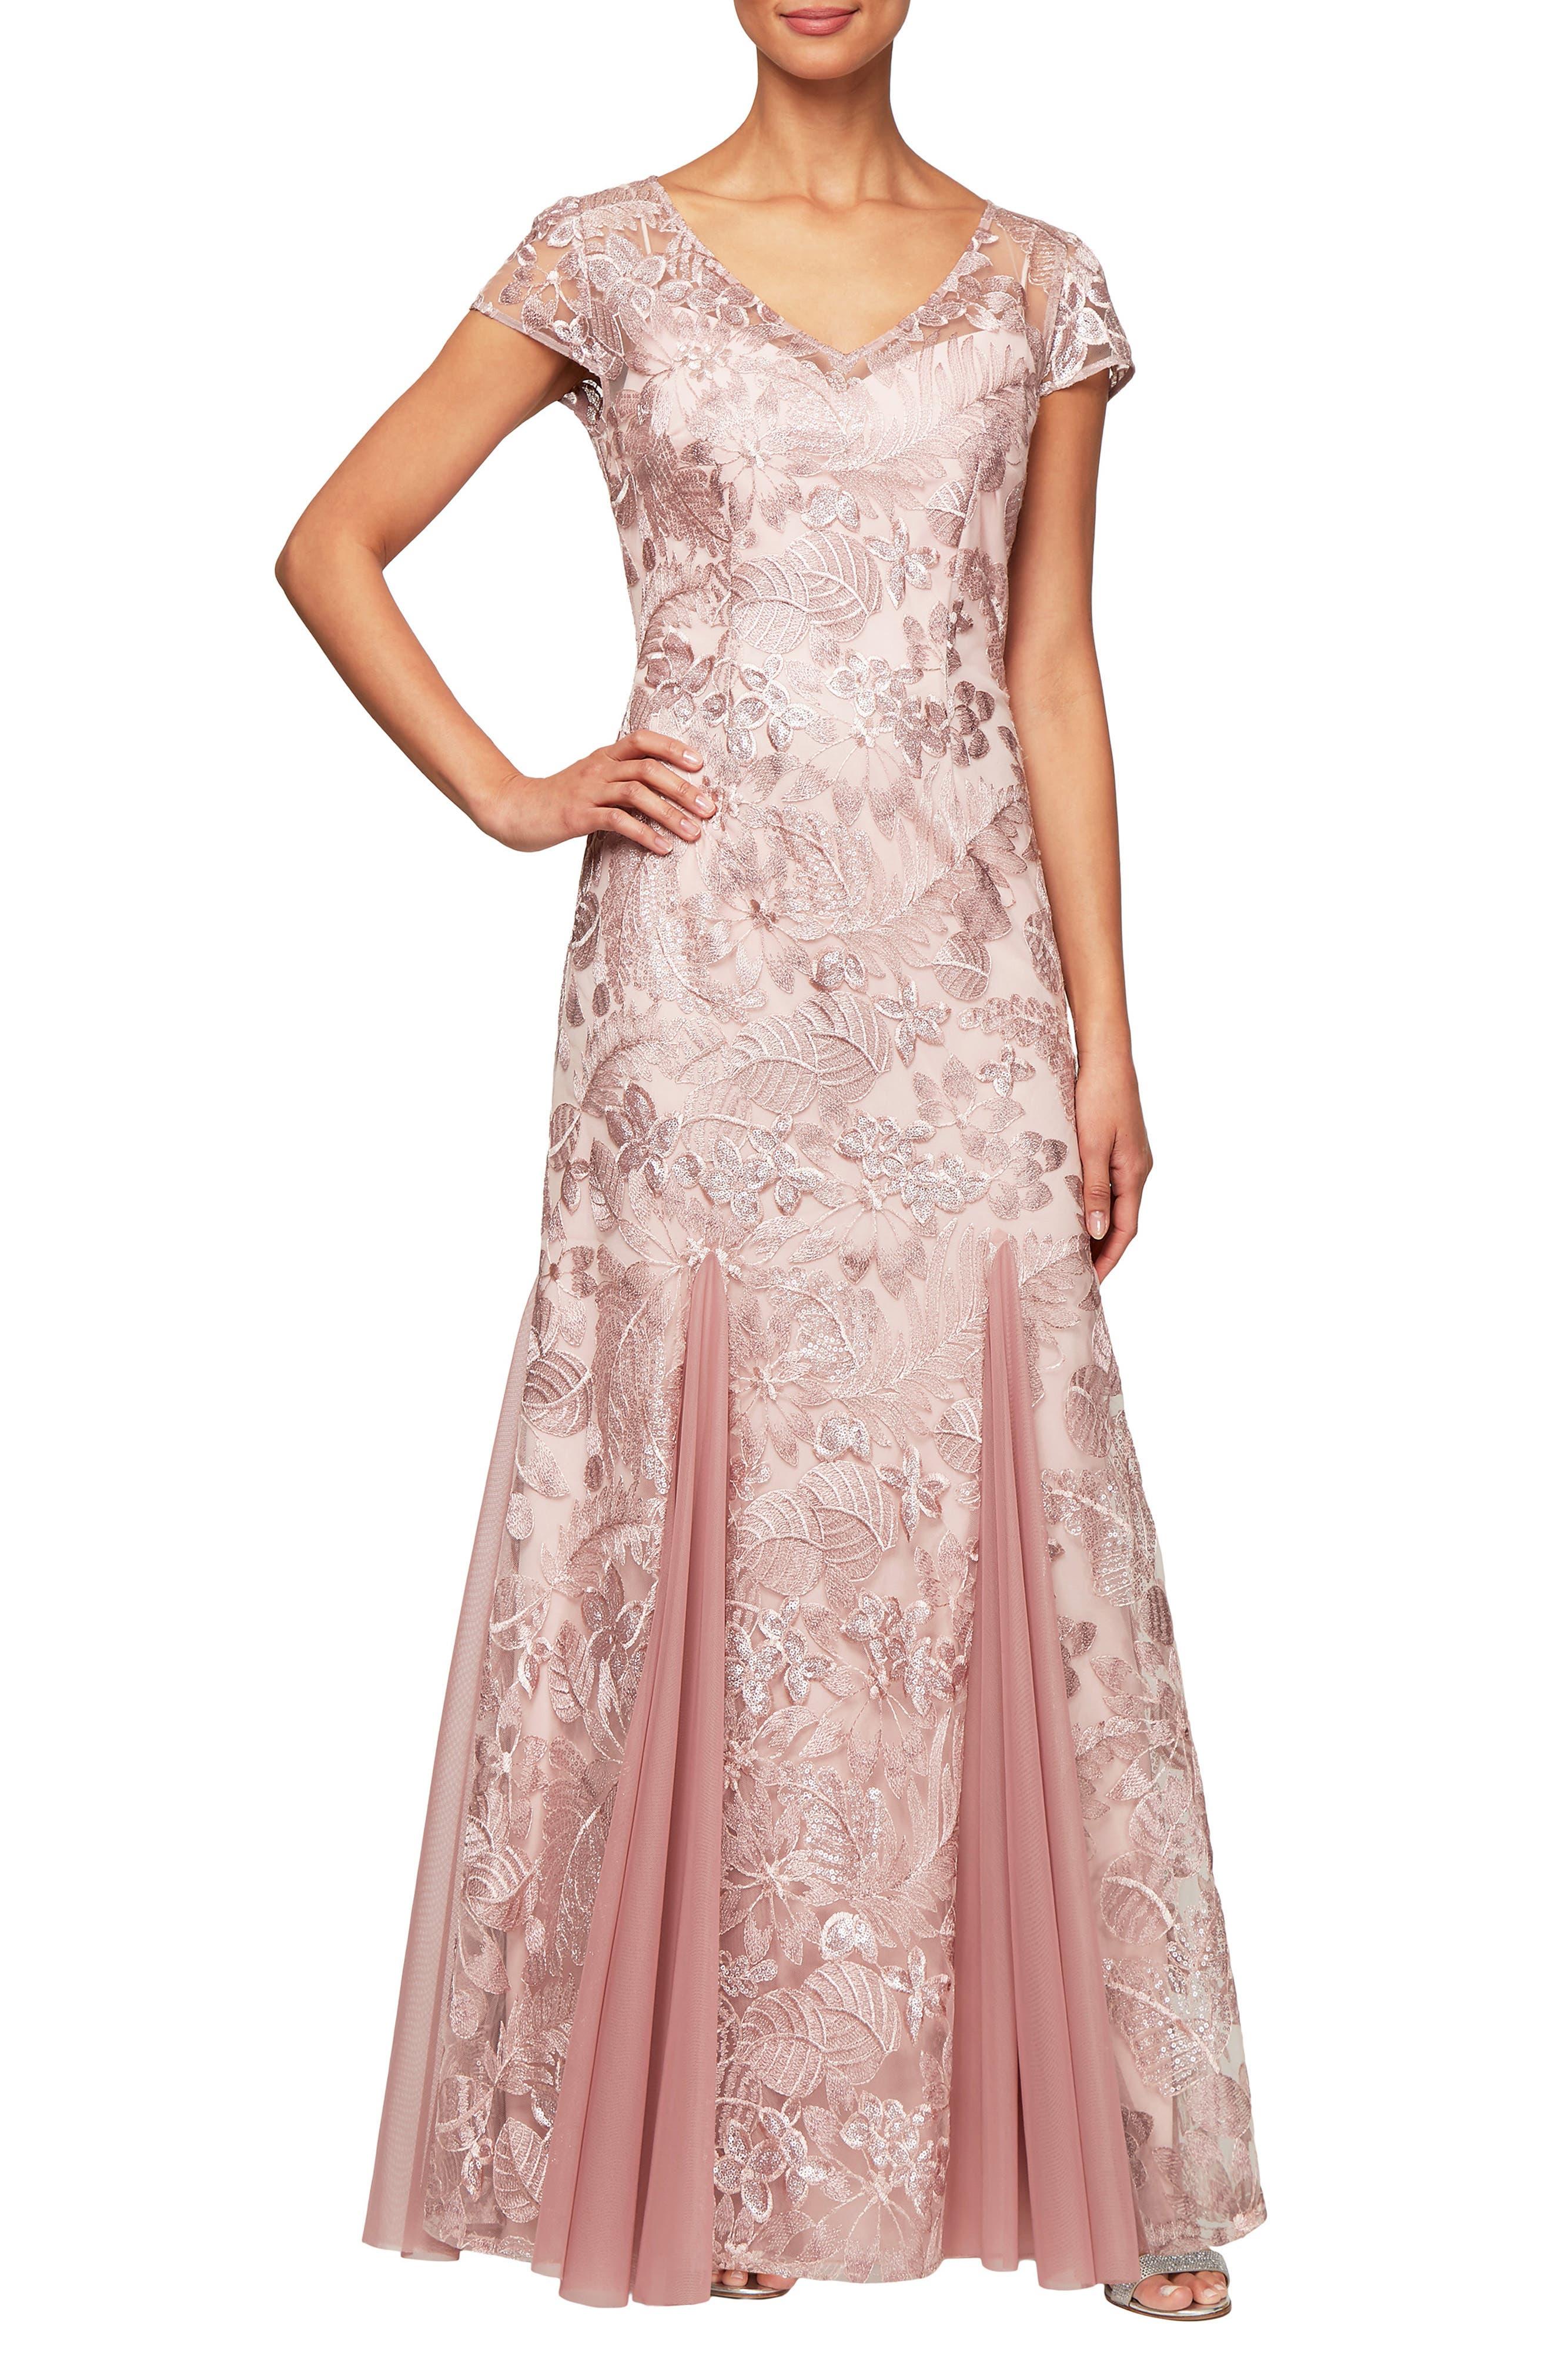 Petite Alex Evenings V-Neck Embroidered Evening Dress, Pink